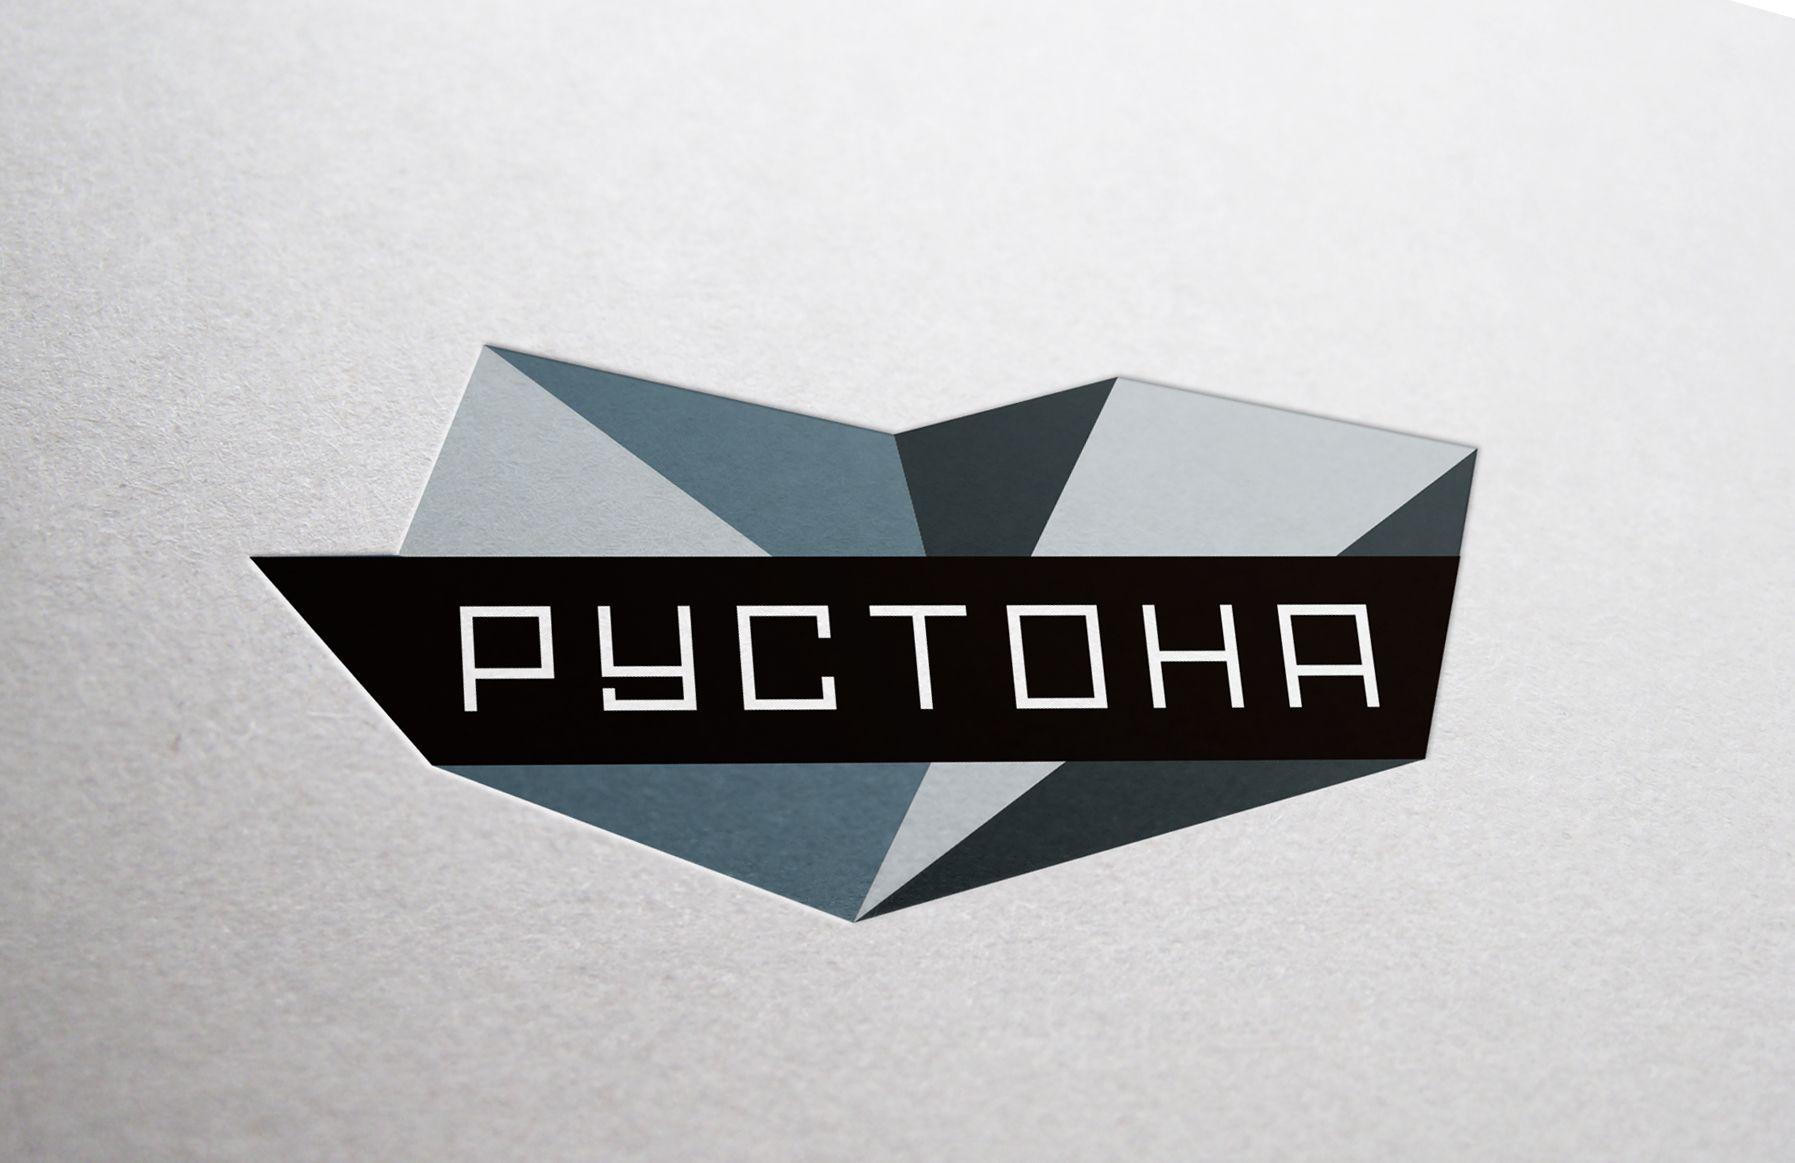 Логотип для компании Рустона (www.rustona.com) - дизайнер IbrAzieV